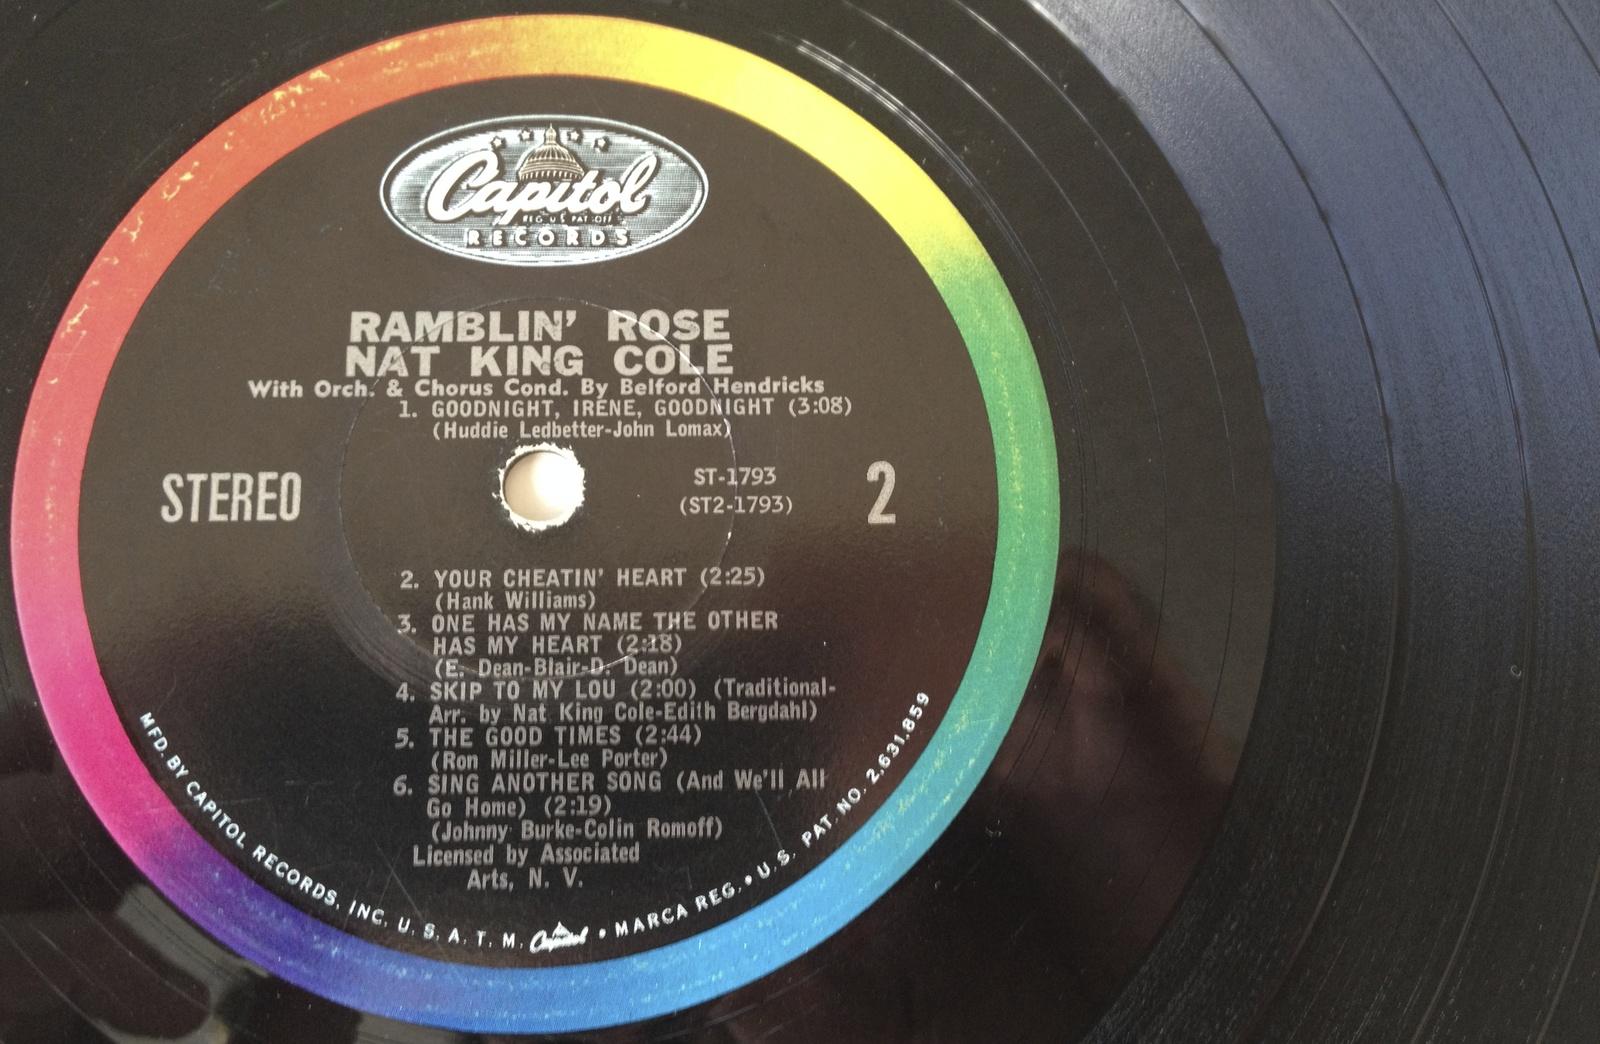 Nat King Cole - Ramblin' Rose LP Vinyl Record Album, Capitol Records